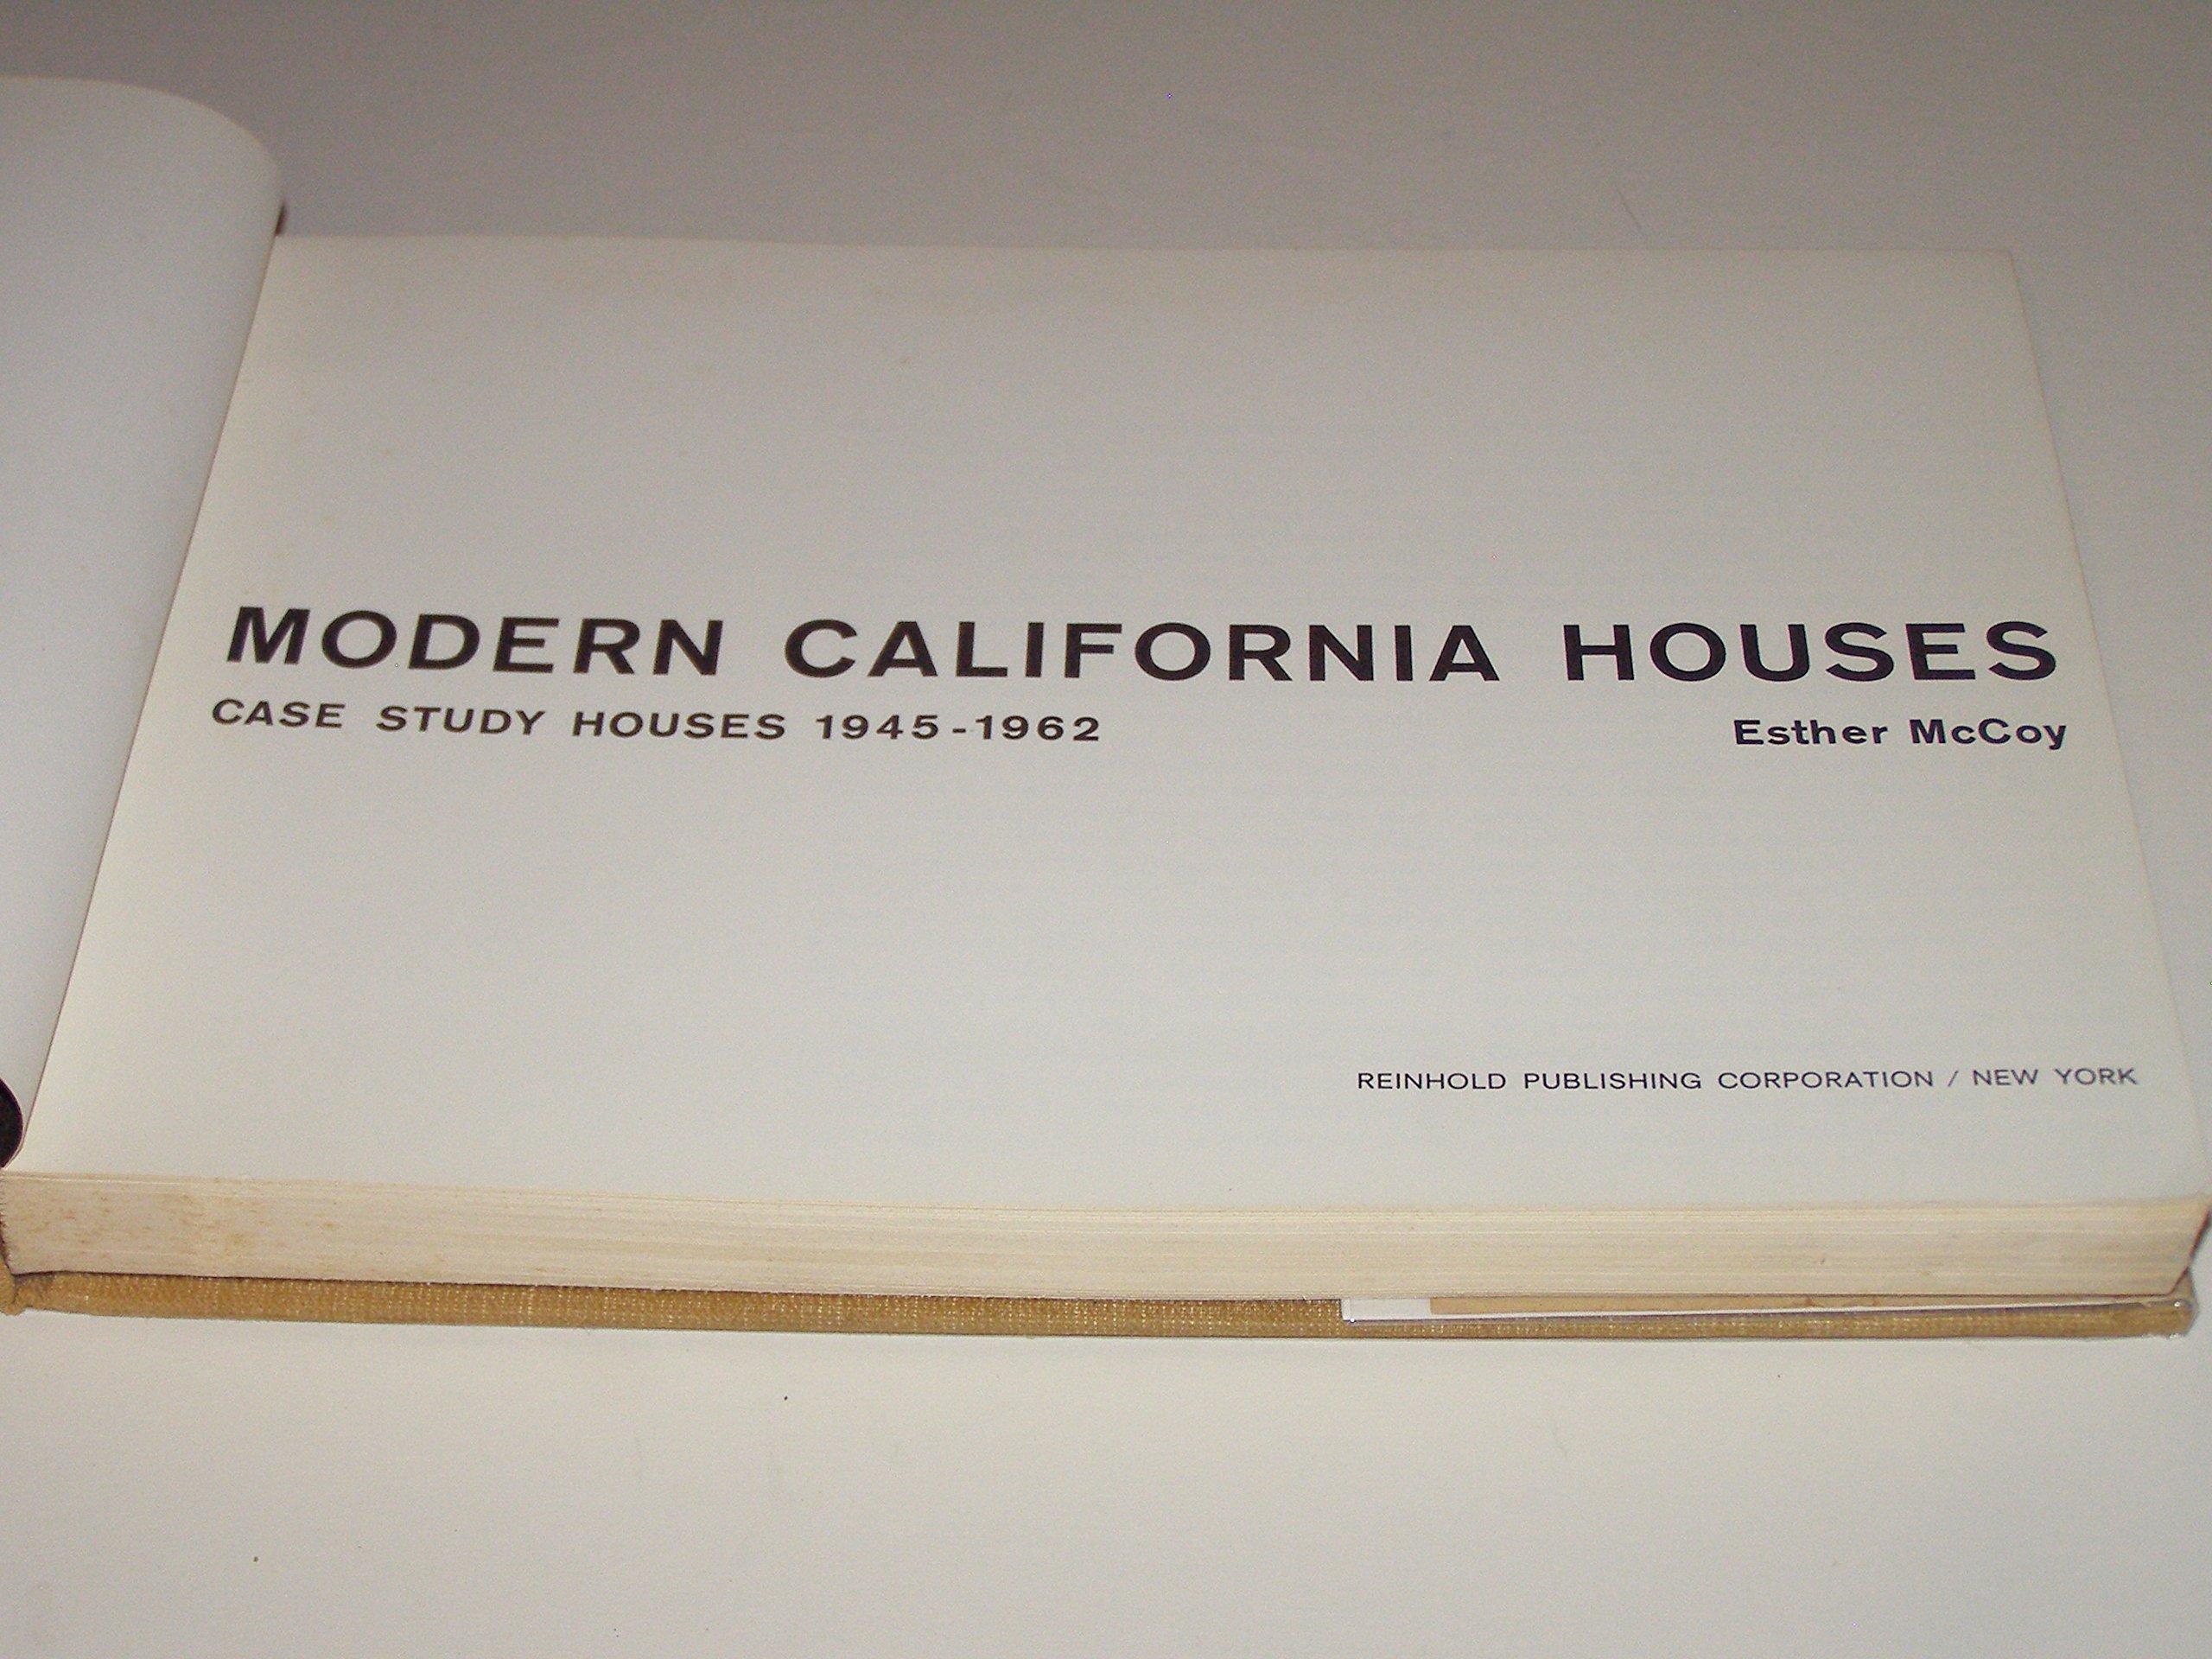 Modern california houses case study houses 1945 1962 esther mccoy amazon com books